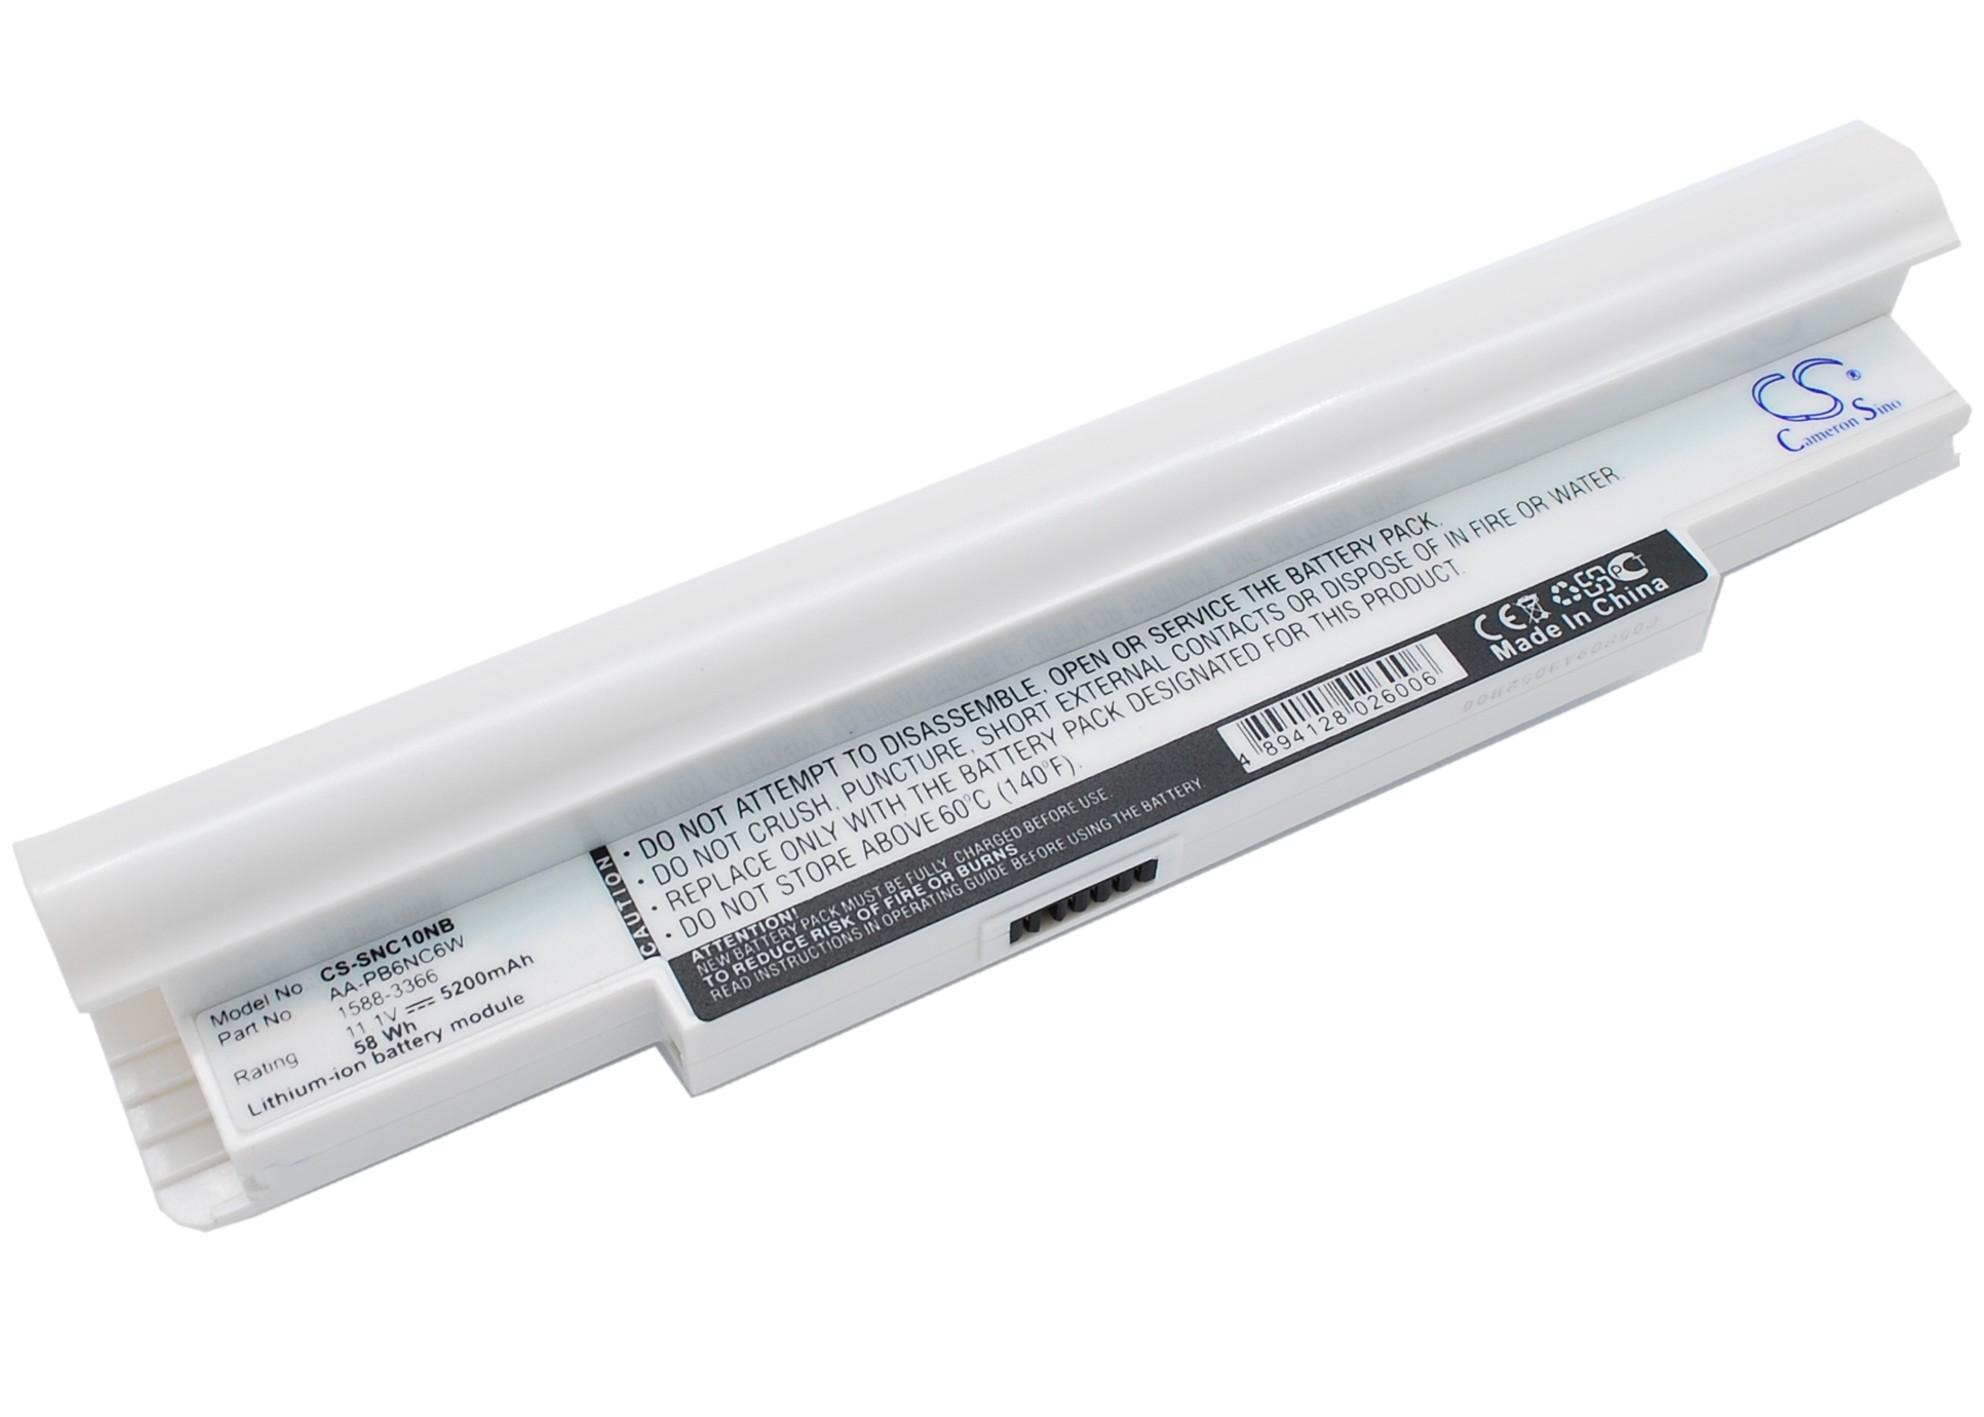 Cameron Sino baterie do notebooků pro SAMSUNG NP-N110 11.1V Li-ion 5200mAh bílá - neoriginální